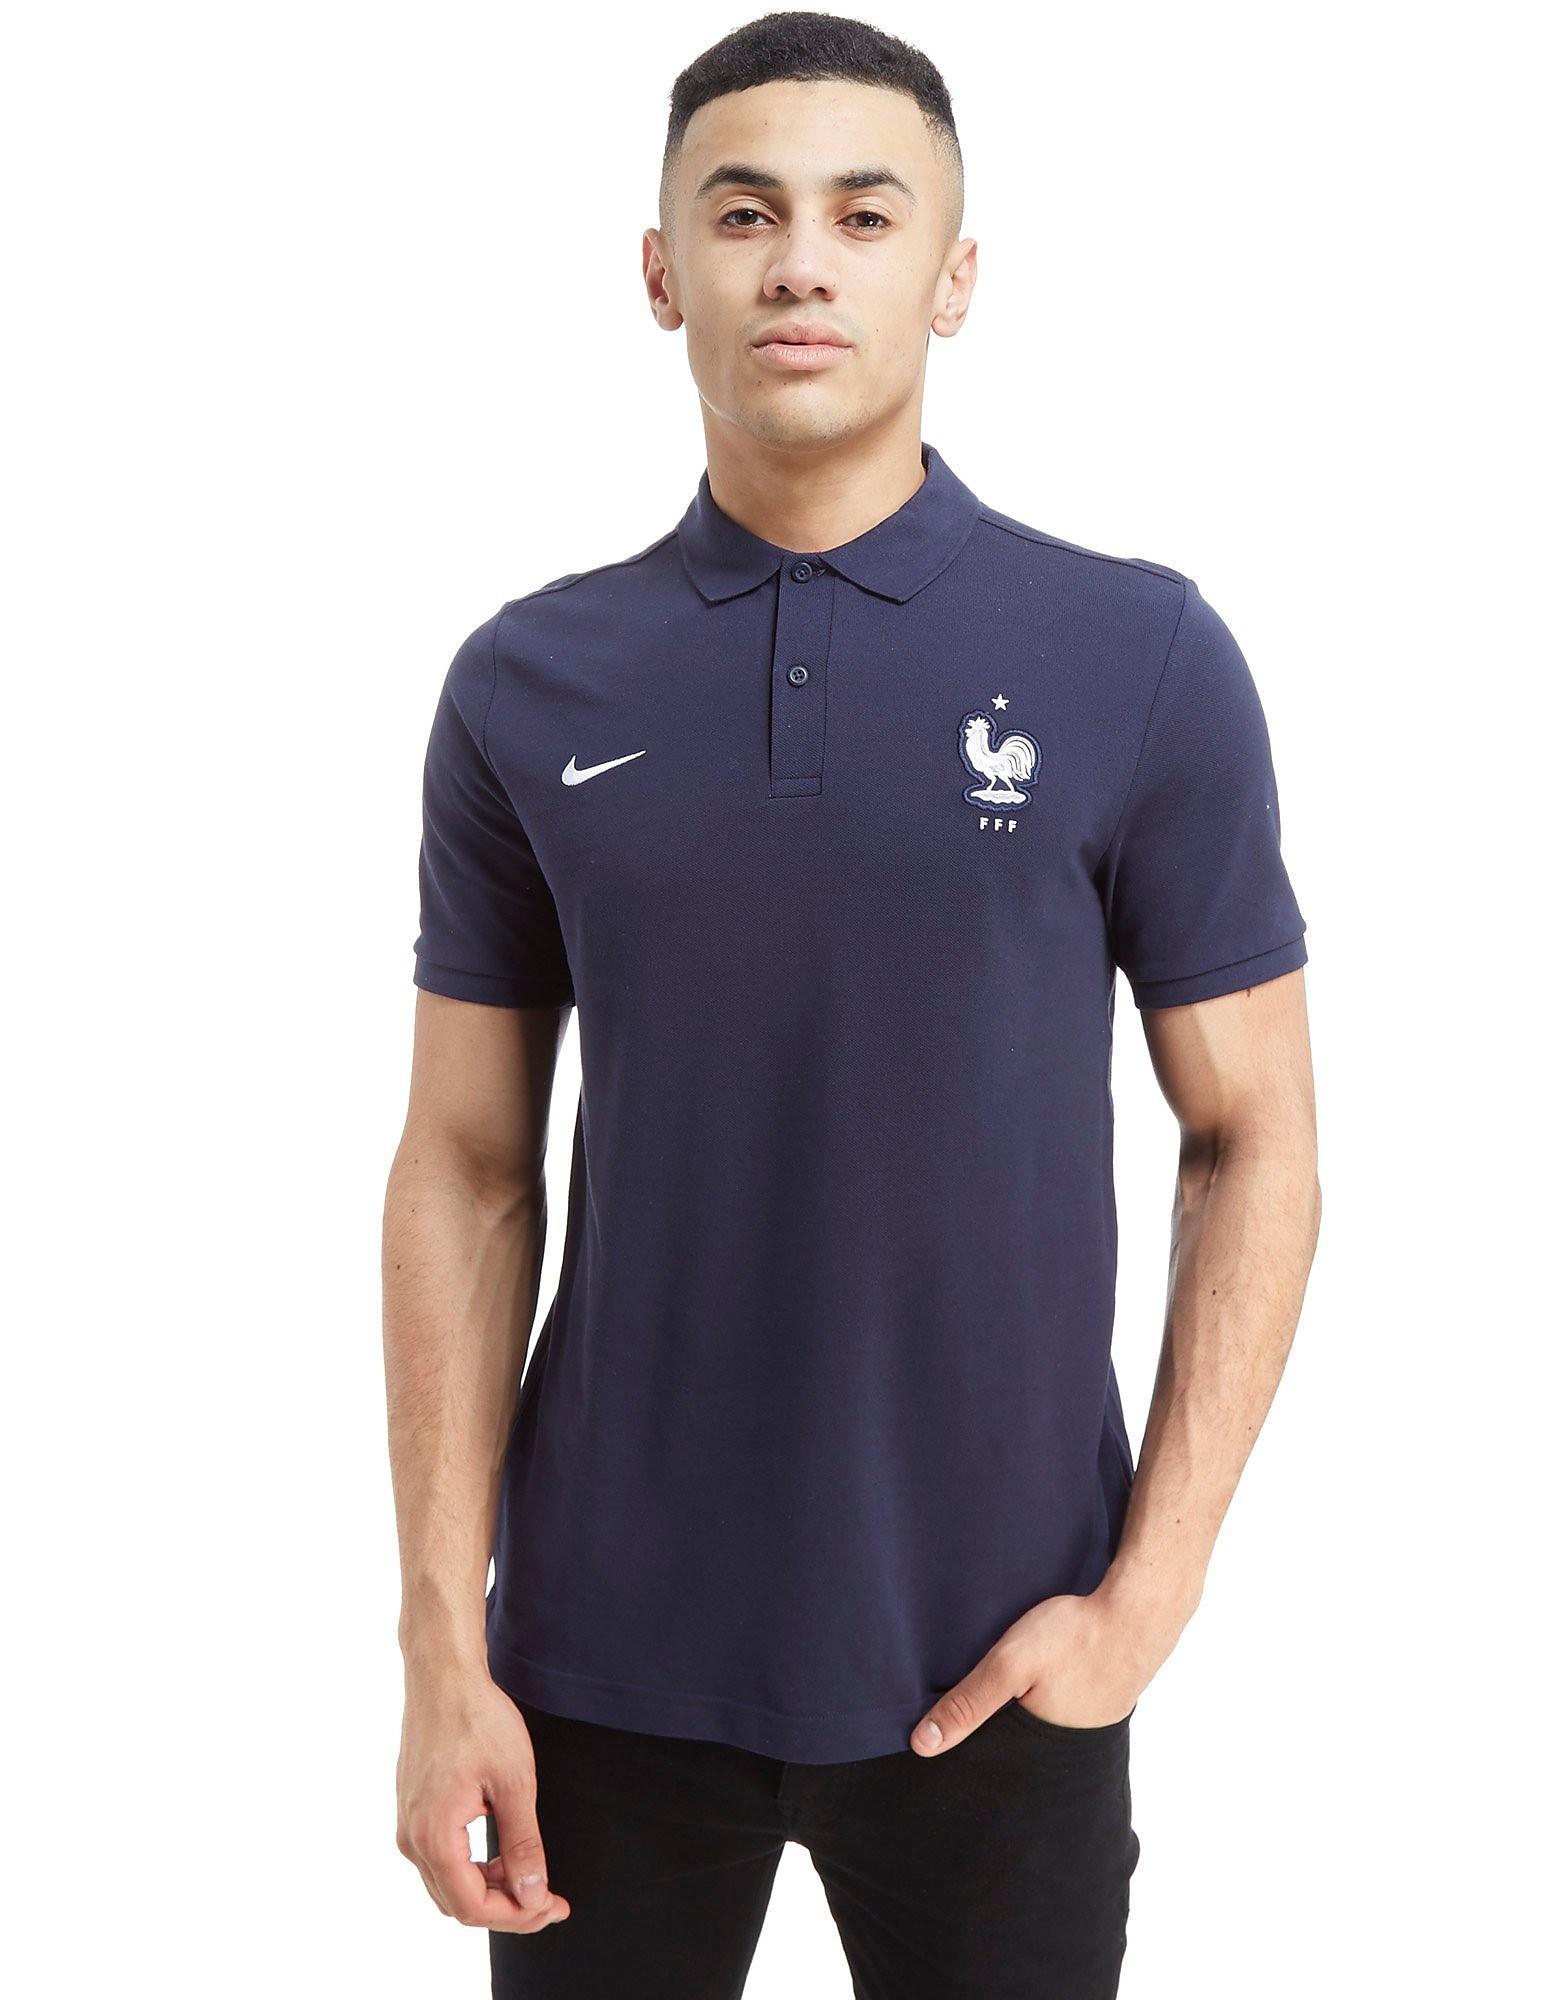 Nike France Polo Shirt